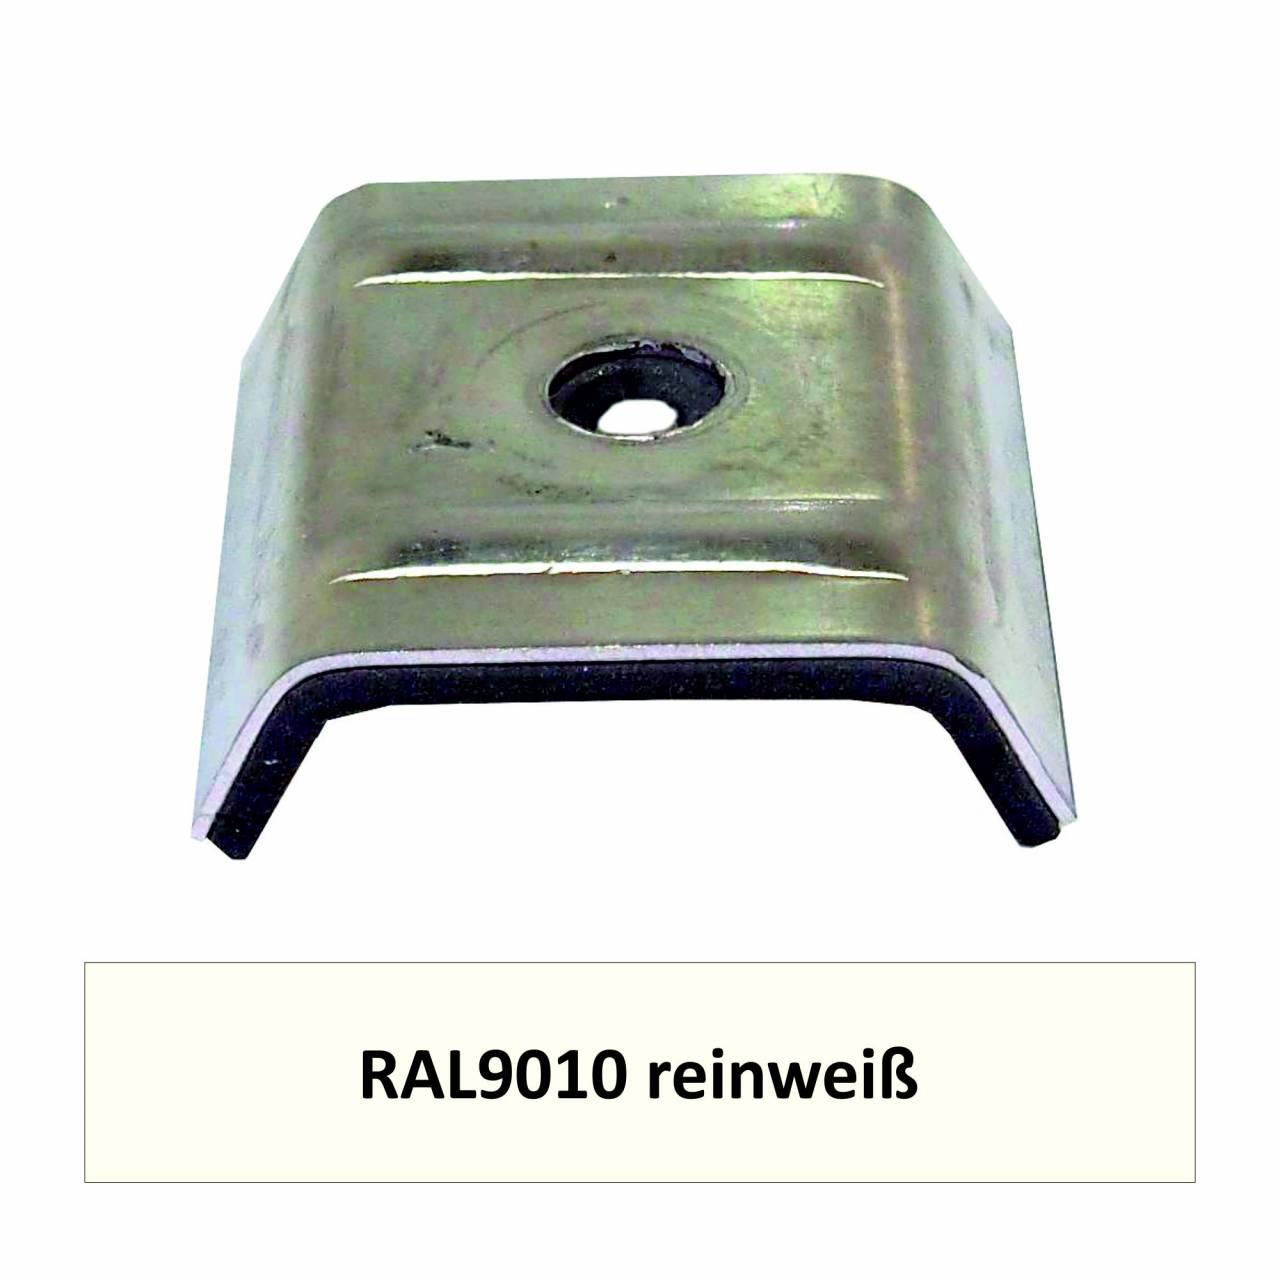 Kalotten für N1000T, Alu RAL9010 reinweiß / Pck a 100 Stück